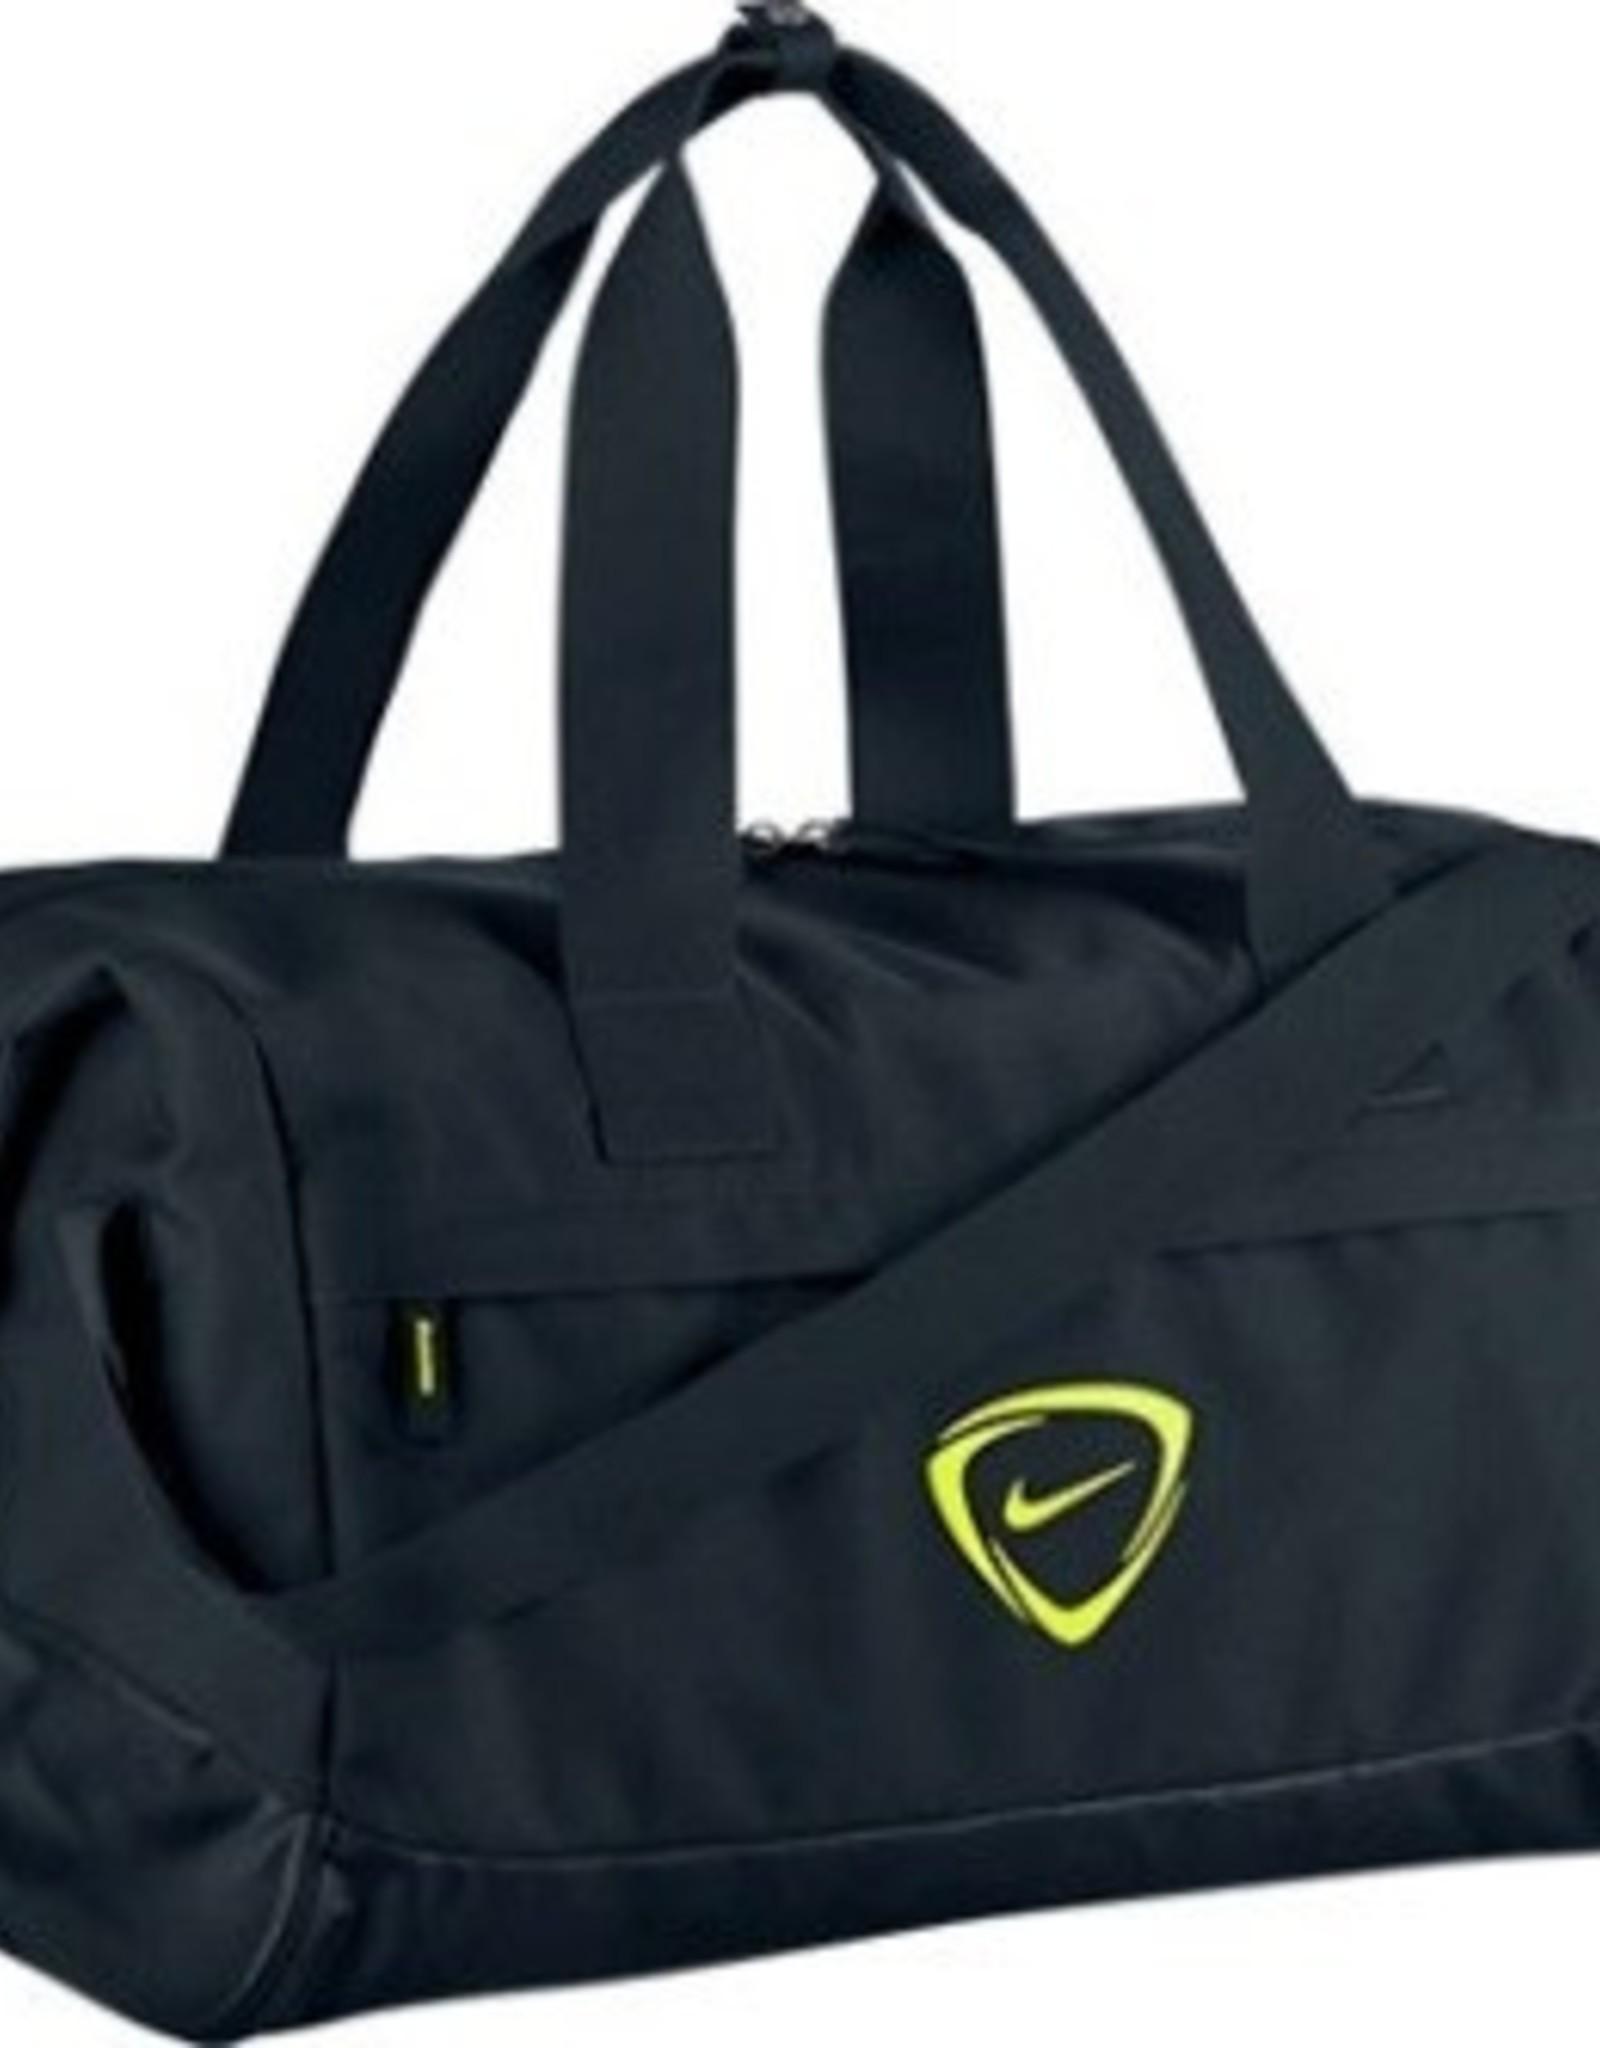 Nike Nike Soccer Compact Duffel  Bag